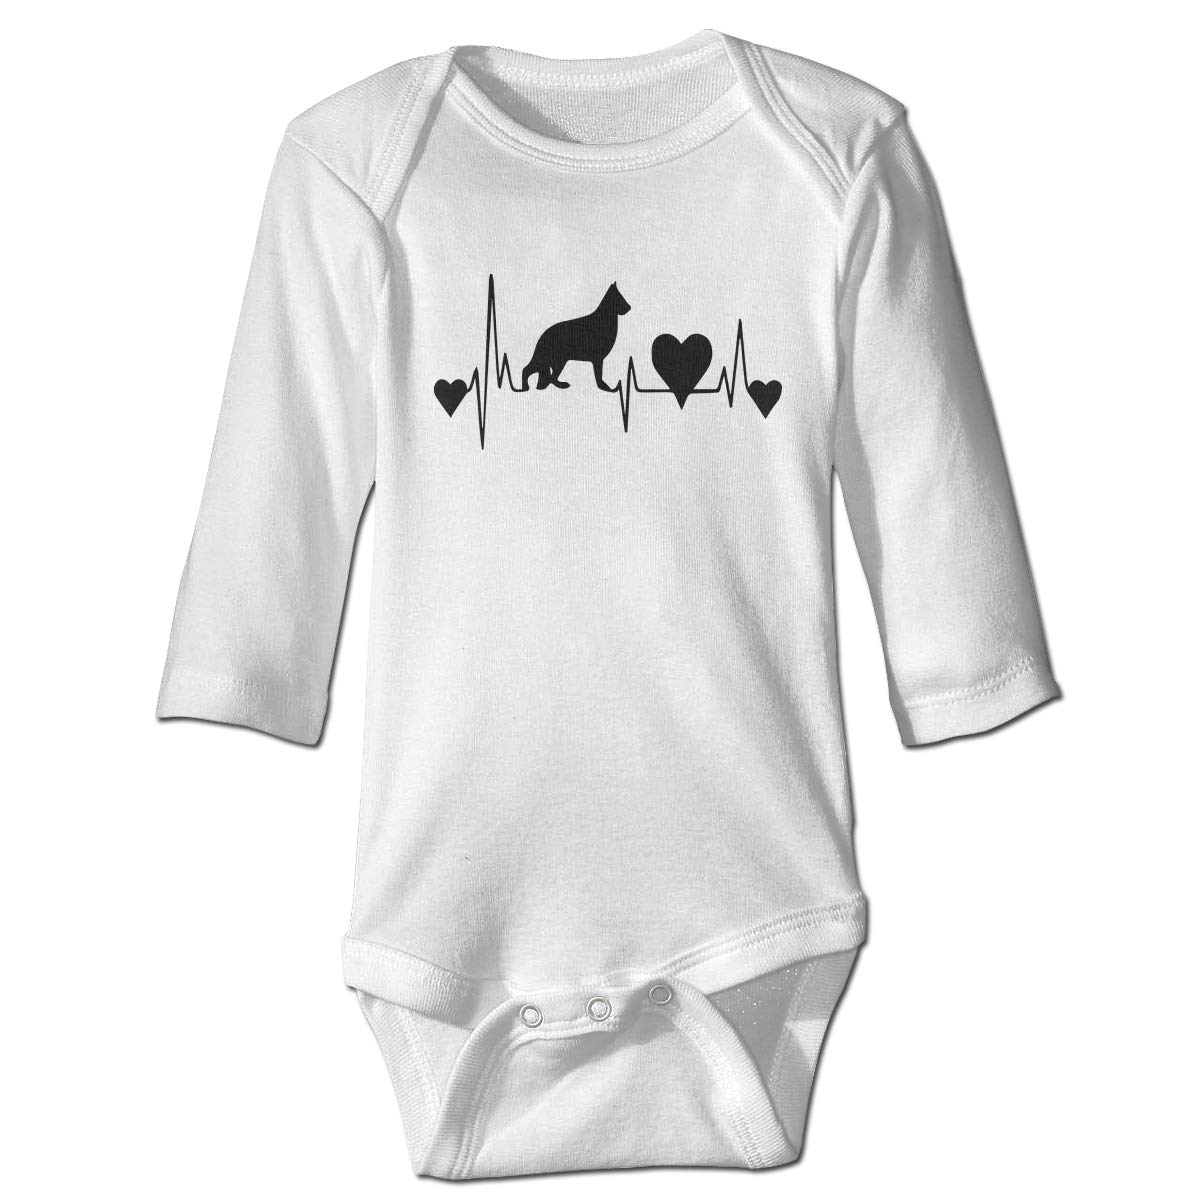 Baby Infant Toddler Romper Bodysuit Jumpsuit German Shepherd Heartbeat Long Sleeve Funny Jumpsuit Romper